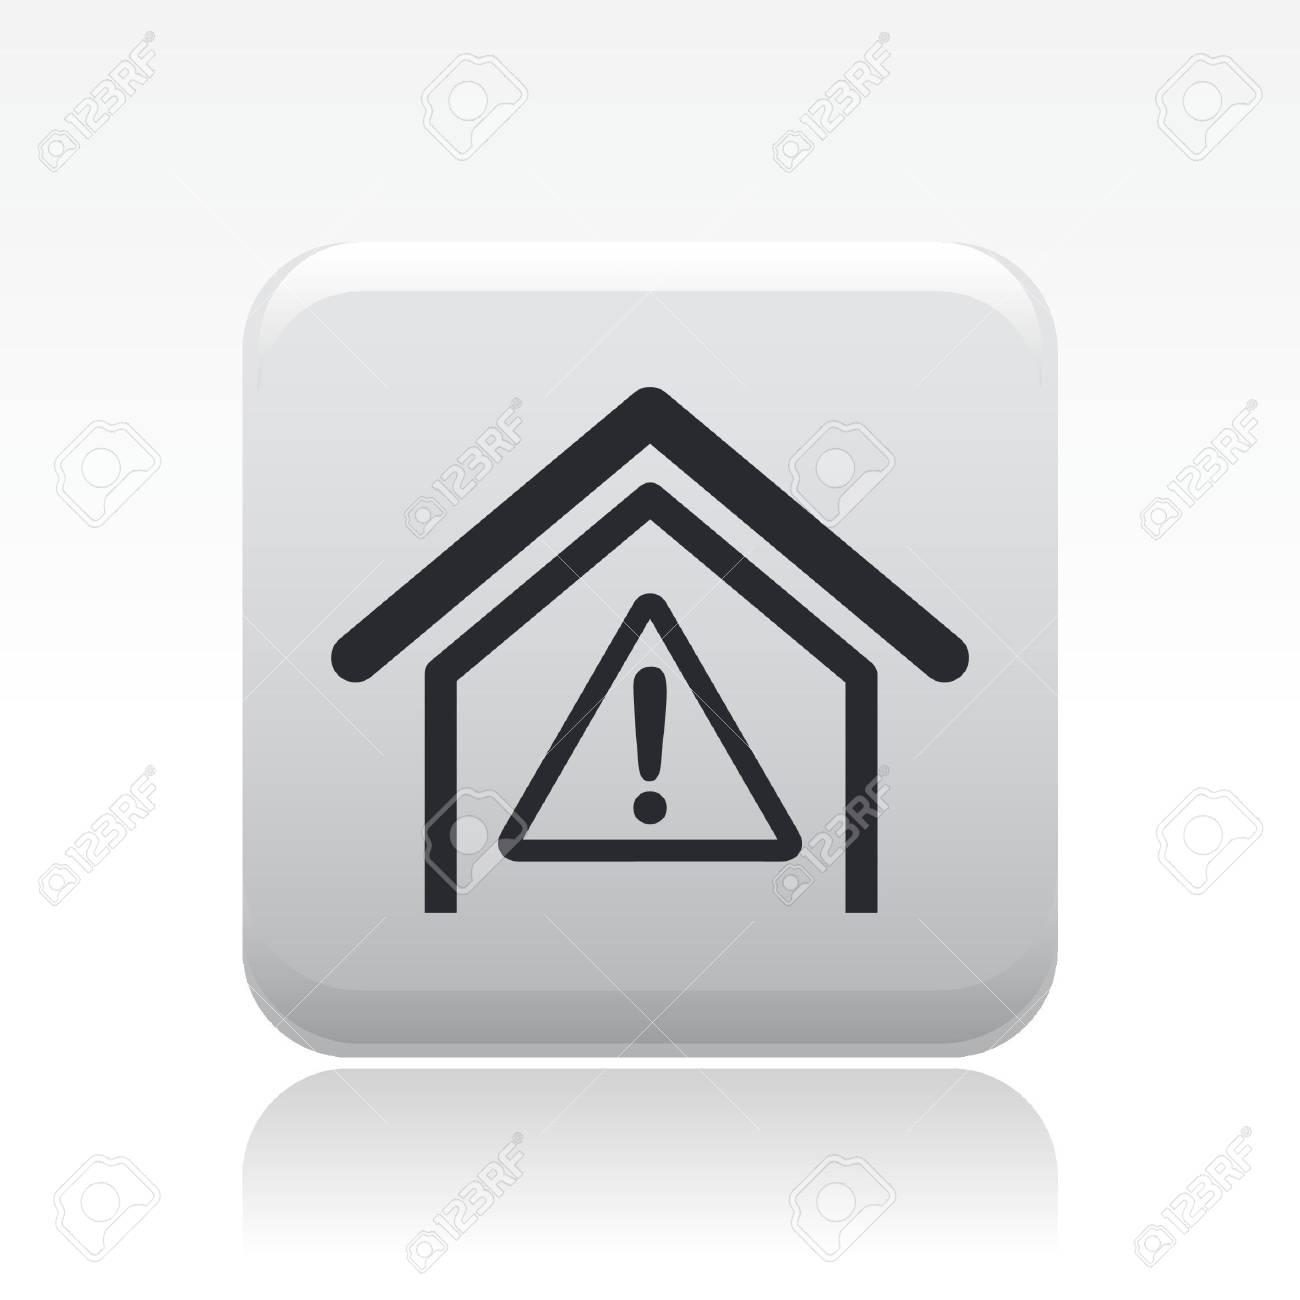 Vector illustration of single danger icon Stock Vector - 12119708